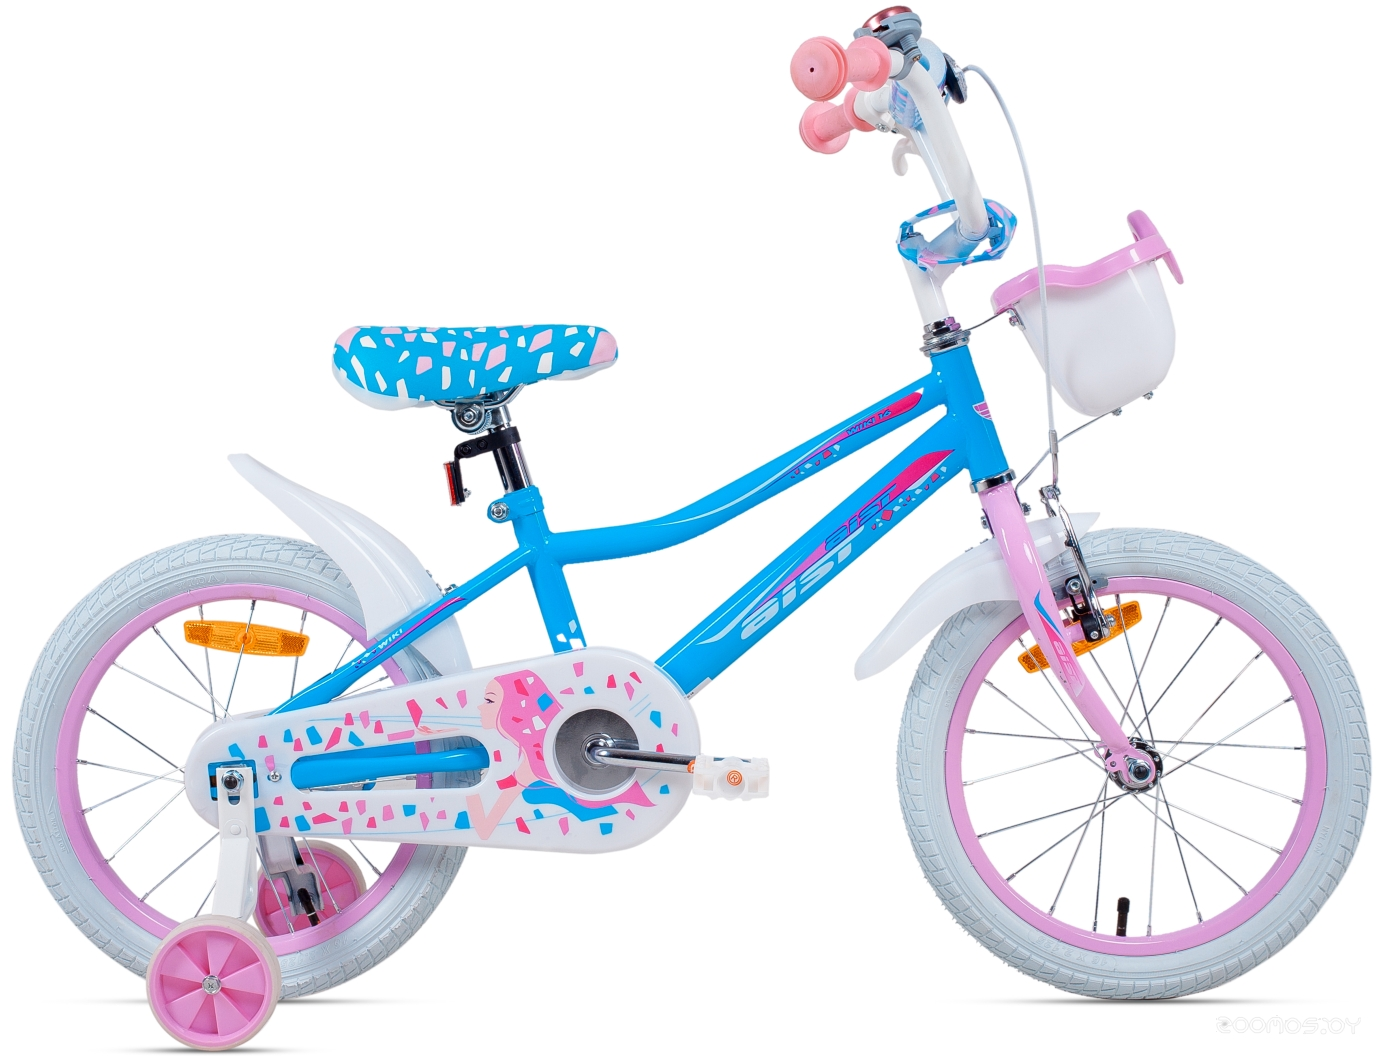 Детский велосипед Aist Wiki 16 (голубой, 2016)